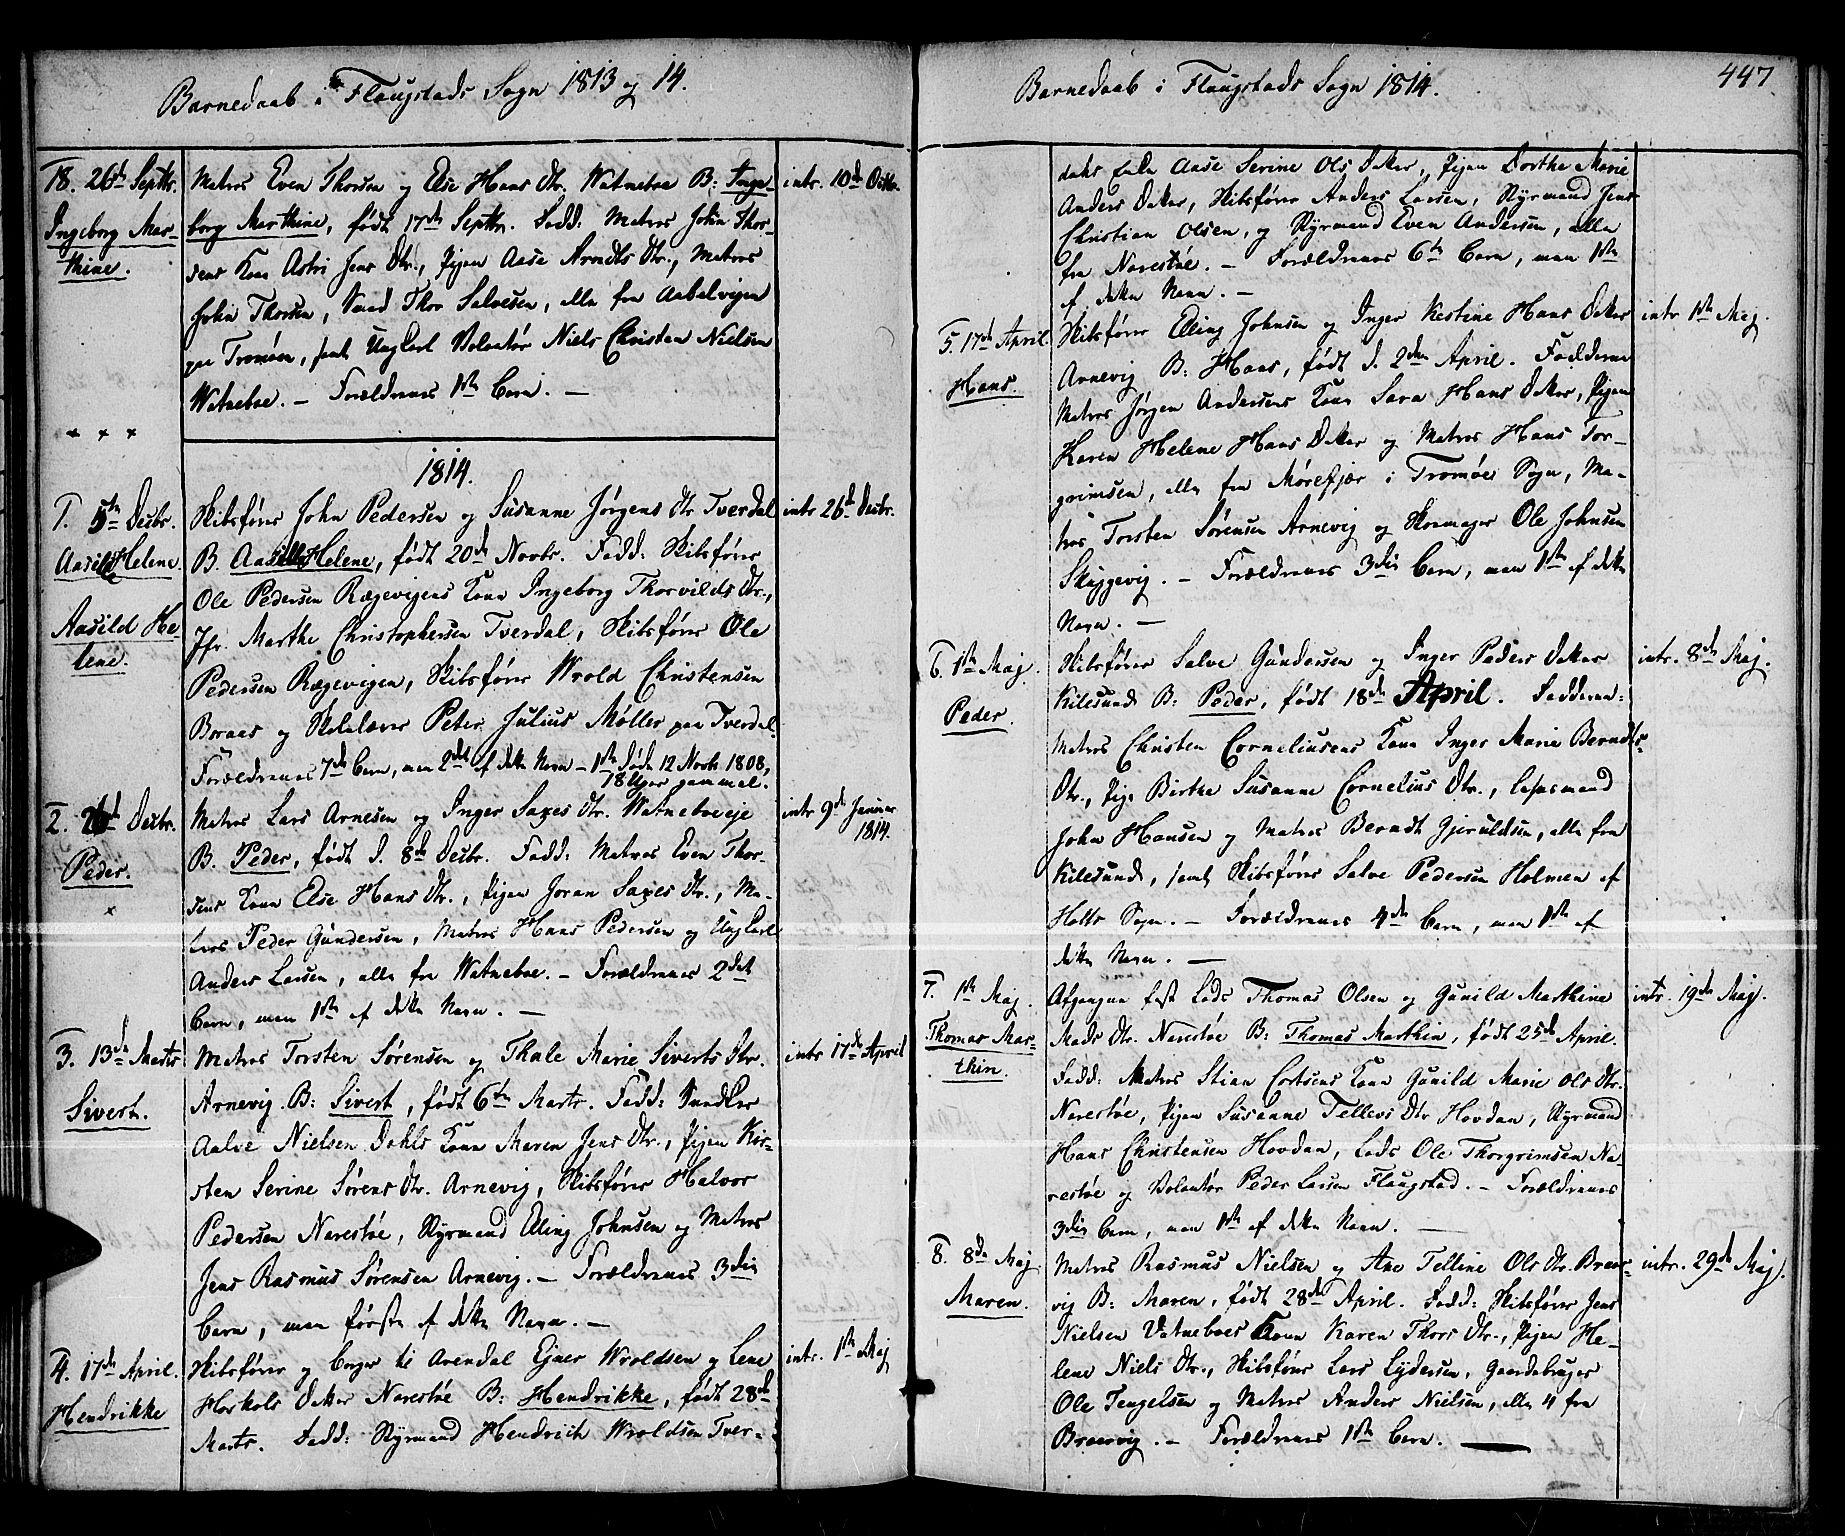 SAK, Dypvåg sokneprestkontor, F/Fa/Faa/L0002: Ministerialbok nr. A 2 /2, 1813-1824, s. 447